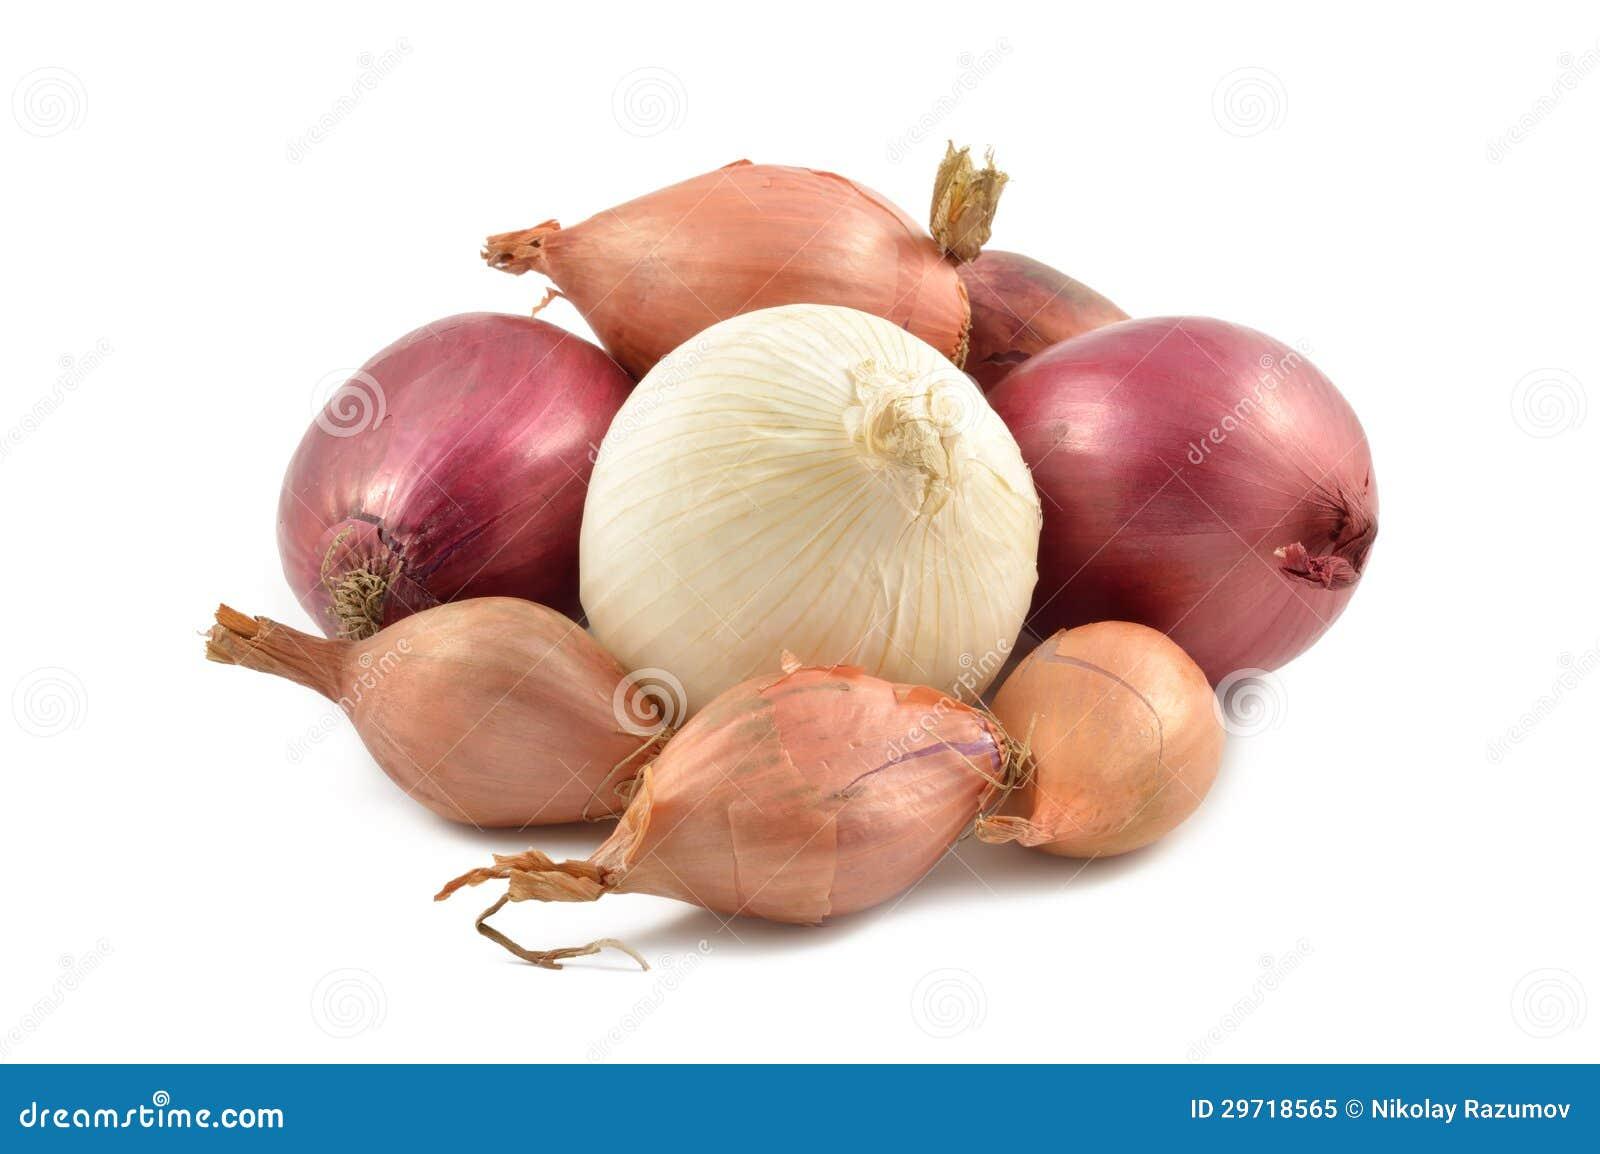 Oignons, échalotes, Ail Et Oignon Blanc Image stock - Image du échalote, simple: 29718565